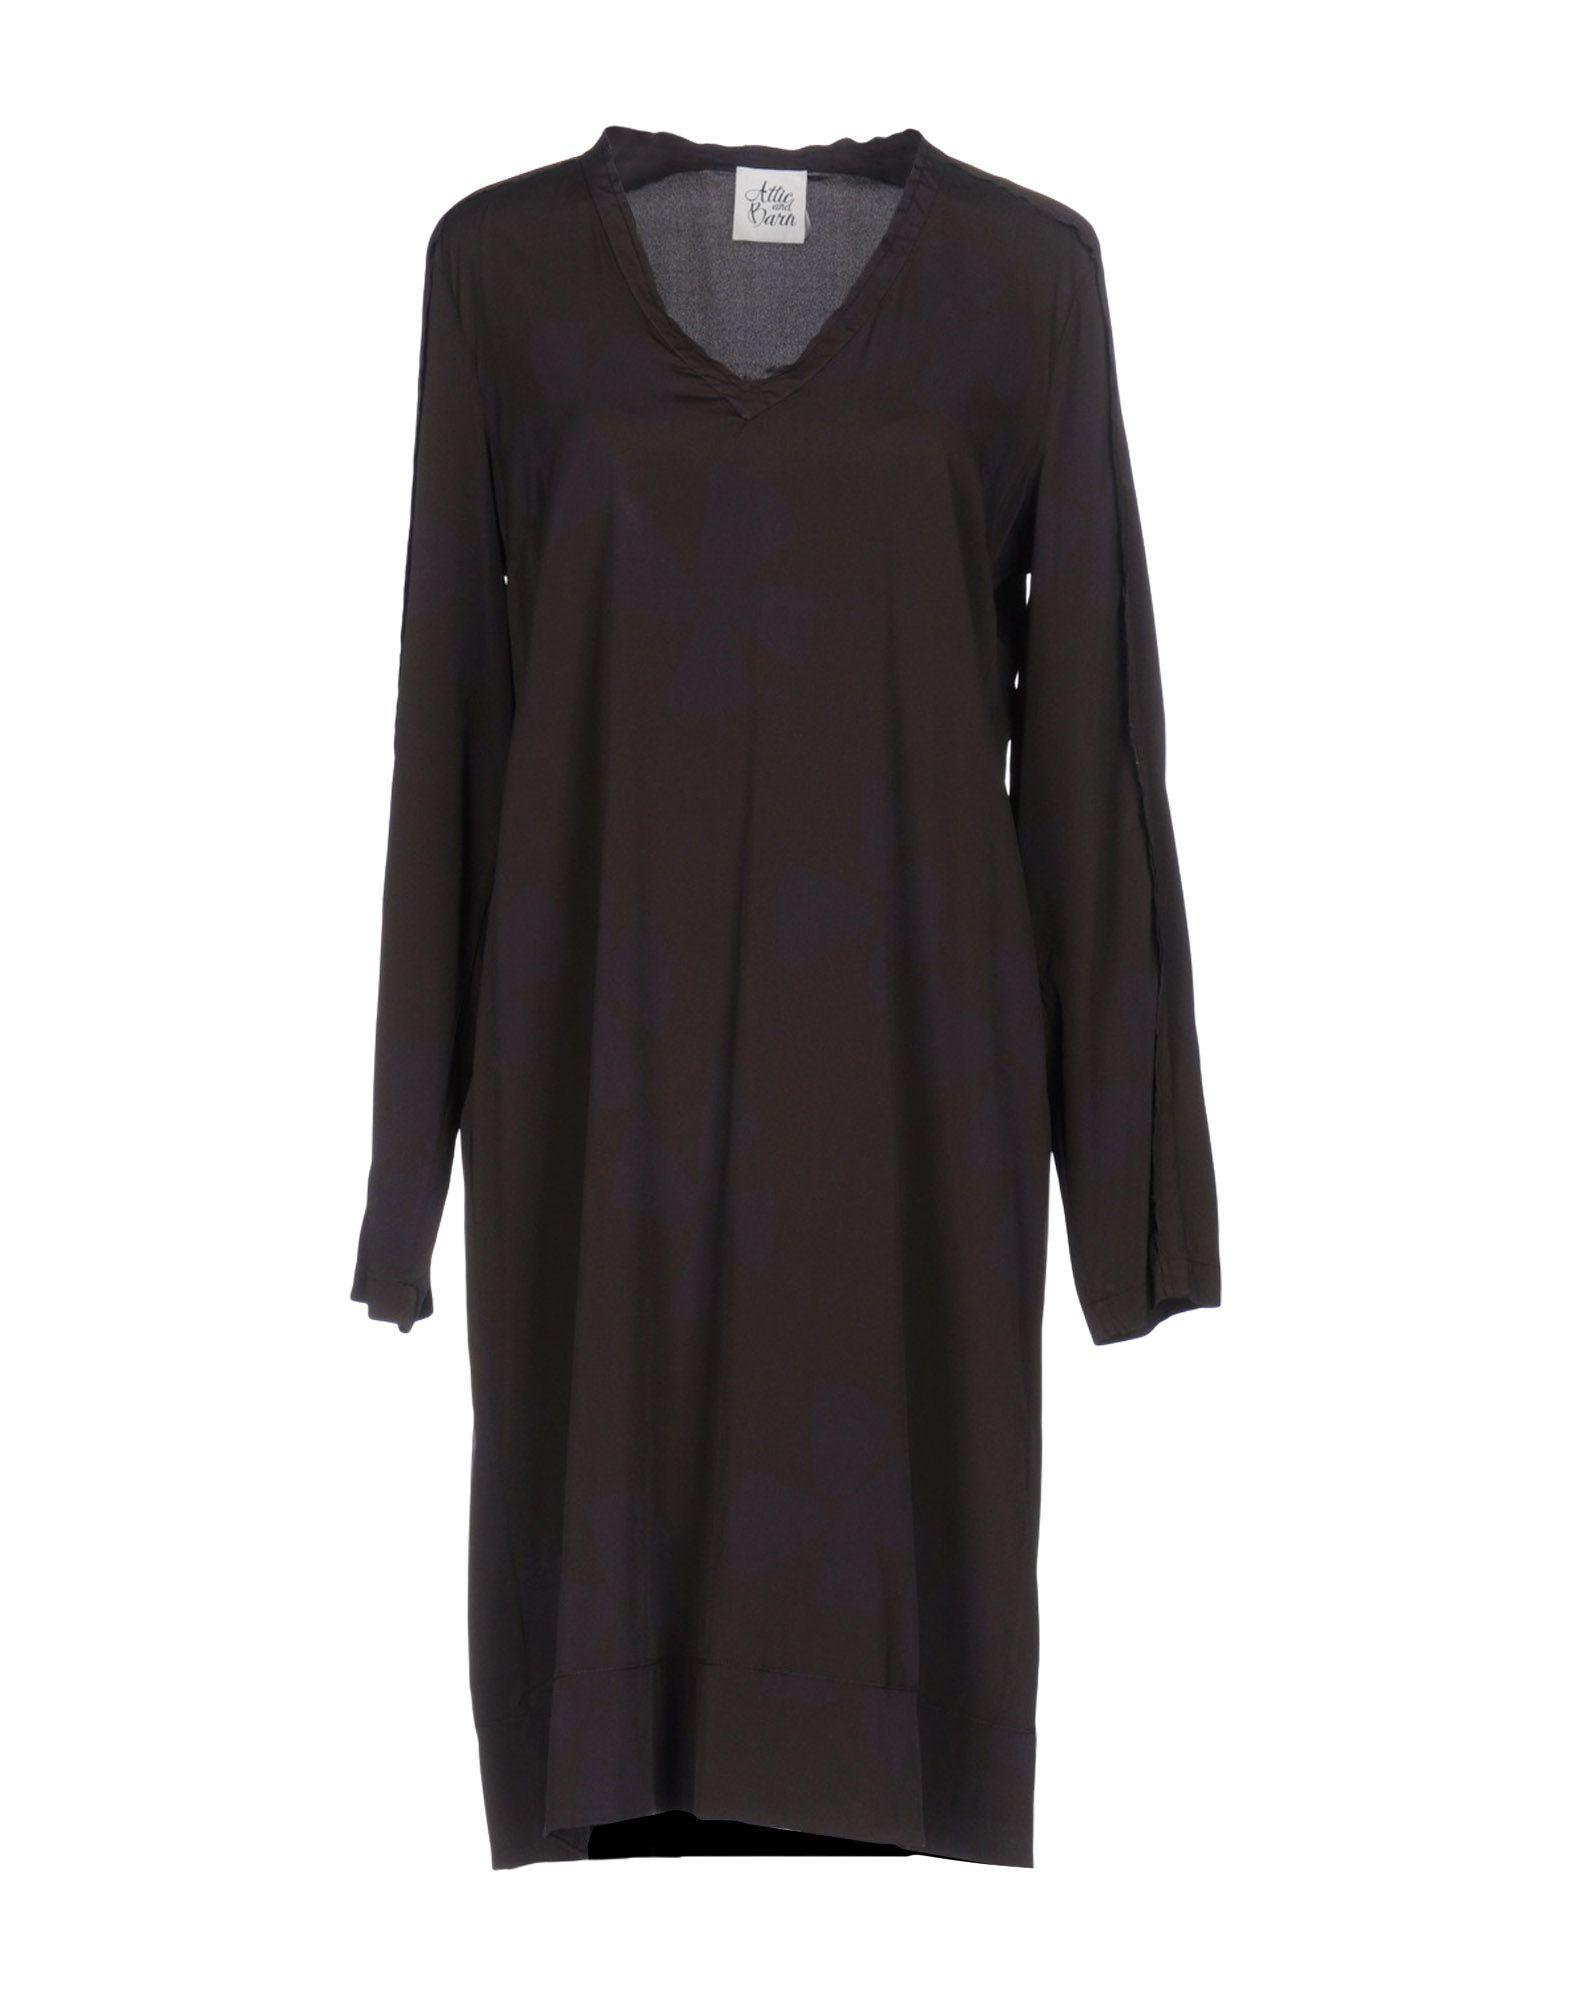 Dress Attic And Barn Dark Brown Women's Silk